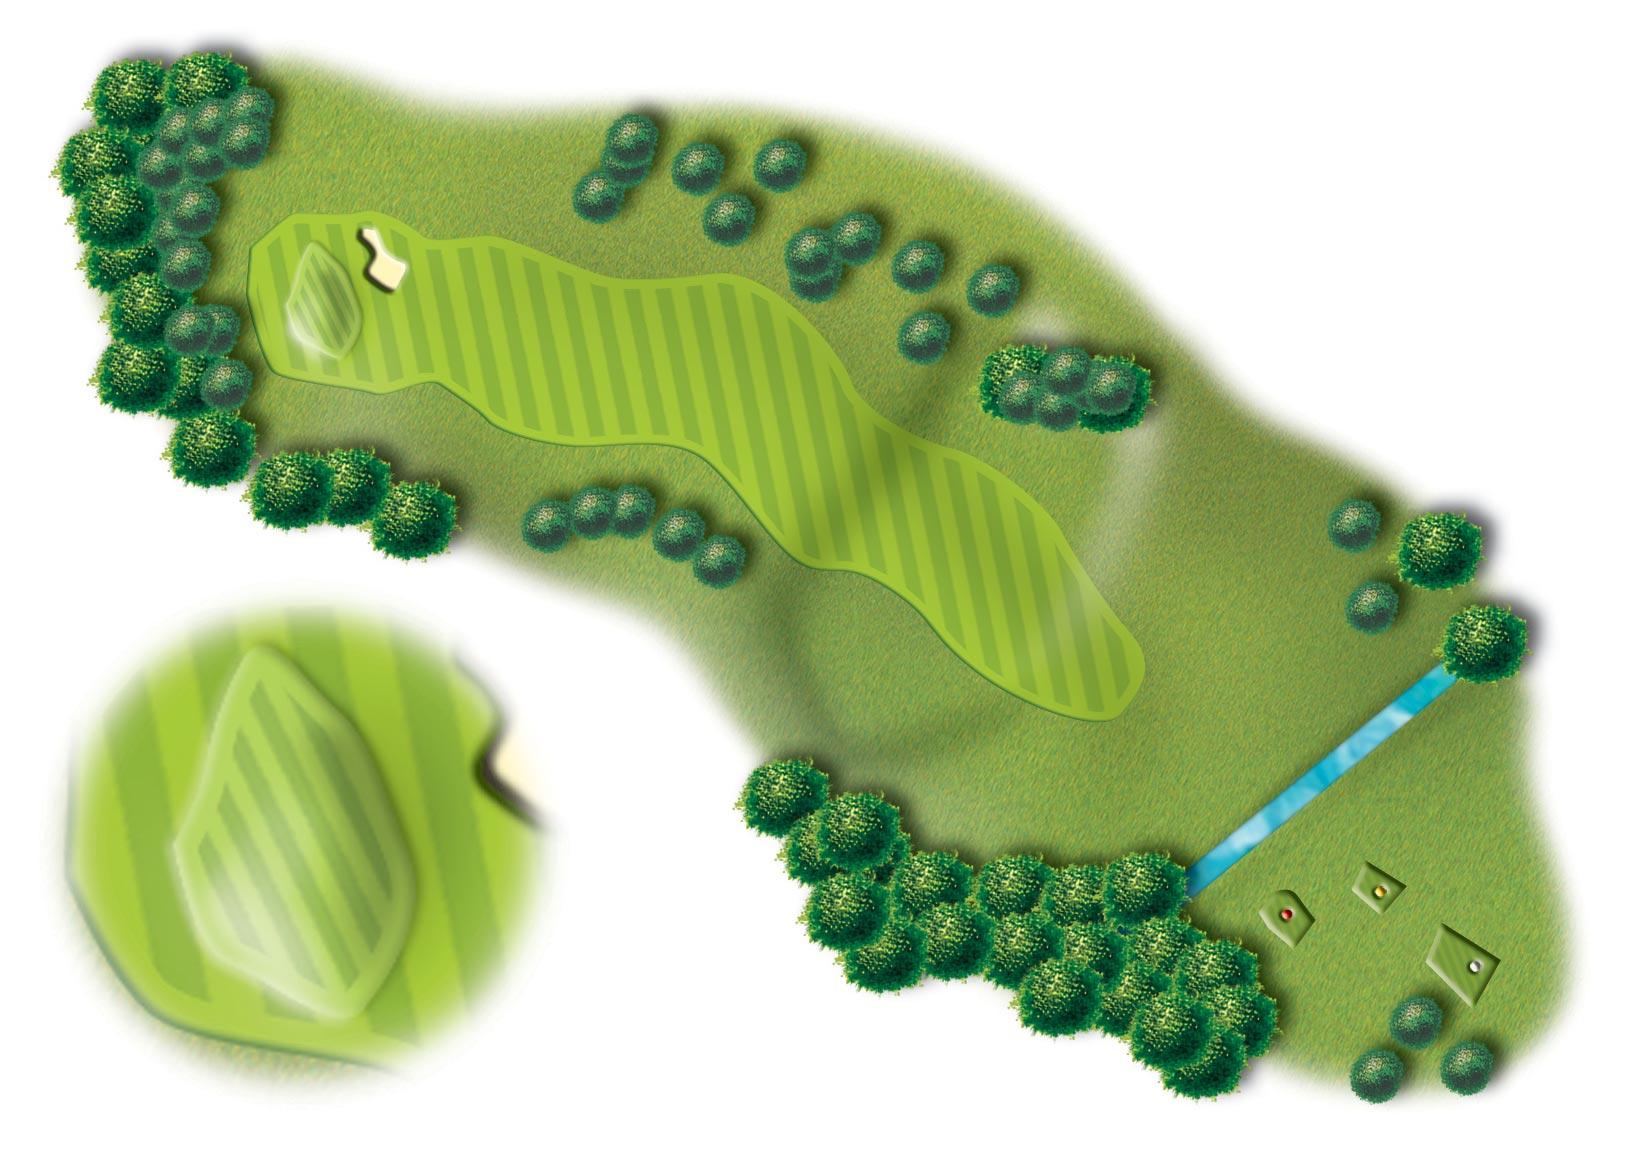 Hole 14, Peebles Golf Club